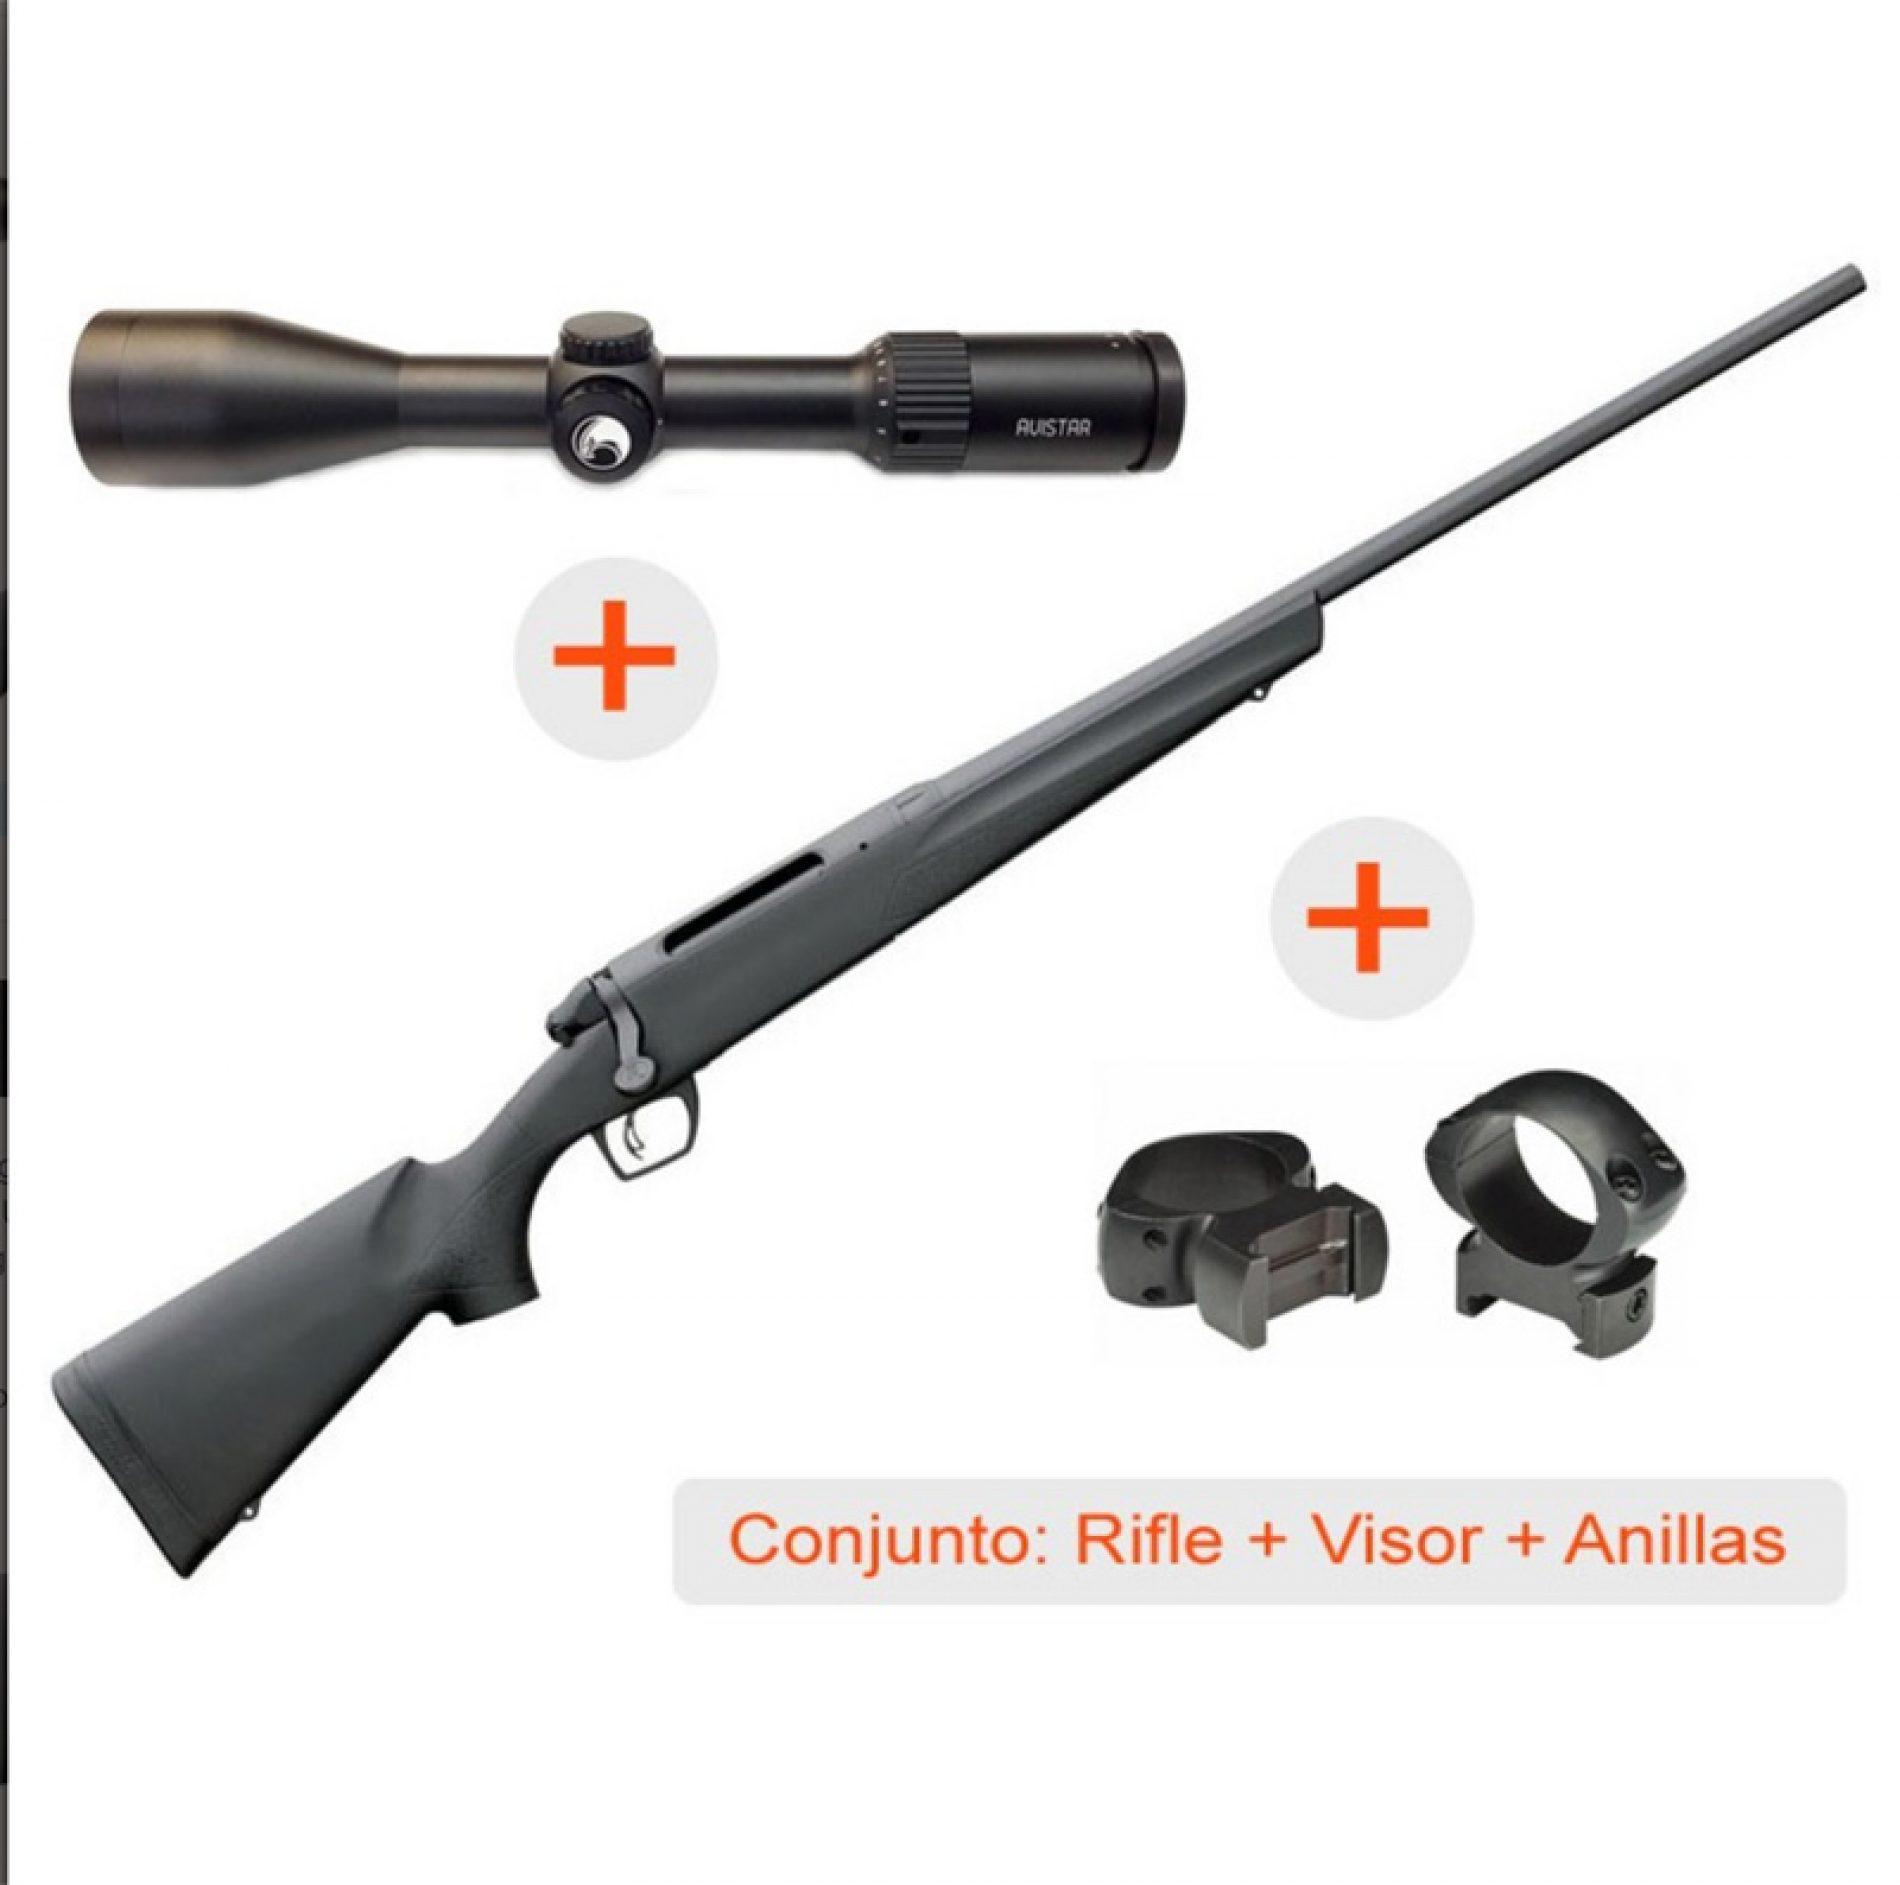 Rifle de cerrojo REMINGTON 783 + Visor AVISTAR 2,5-10×50 R.I. + Anillas WEAVER Grand Slam